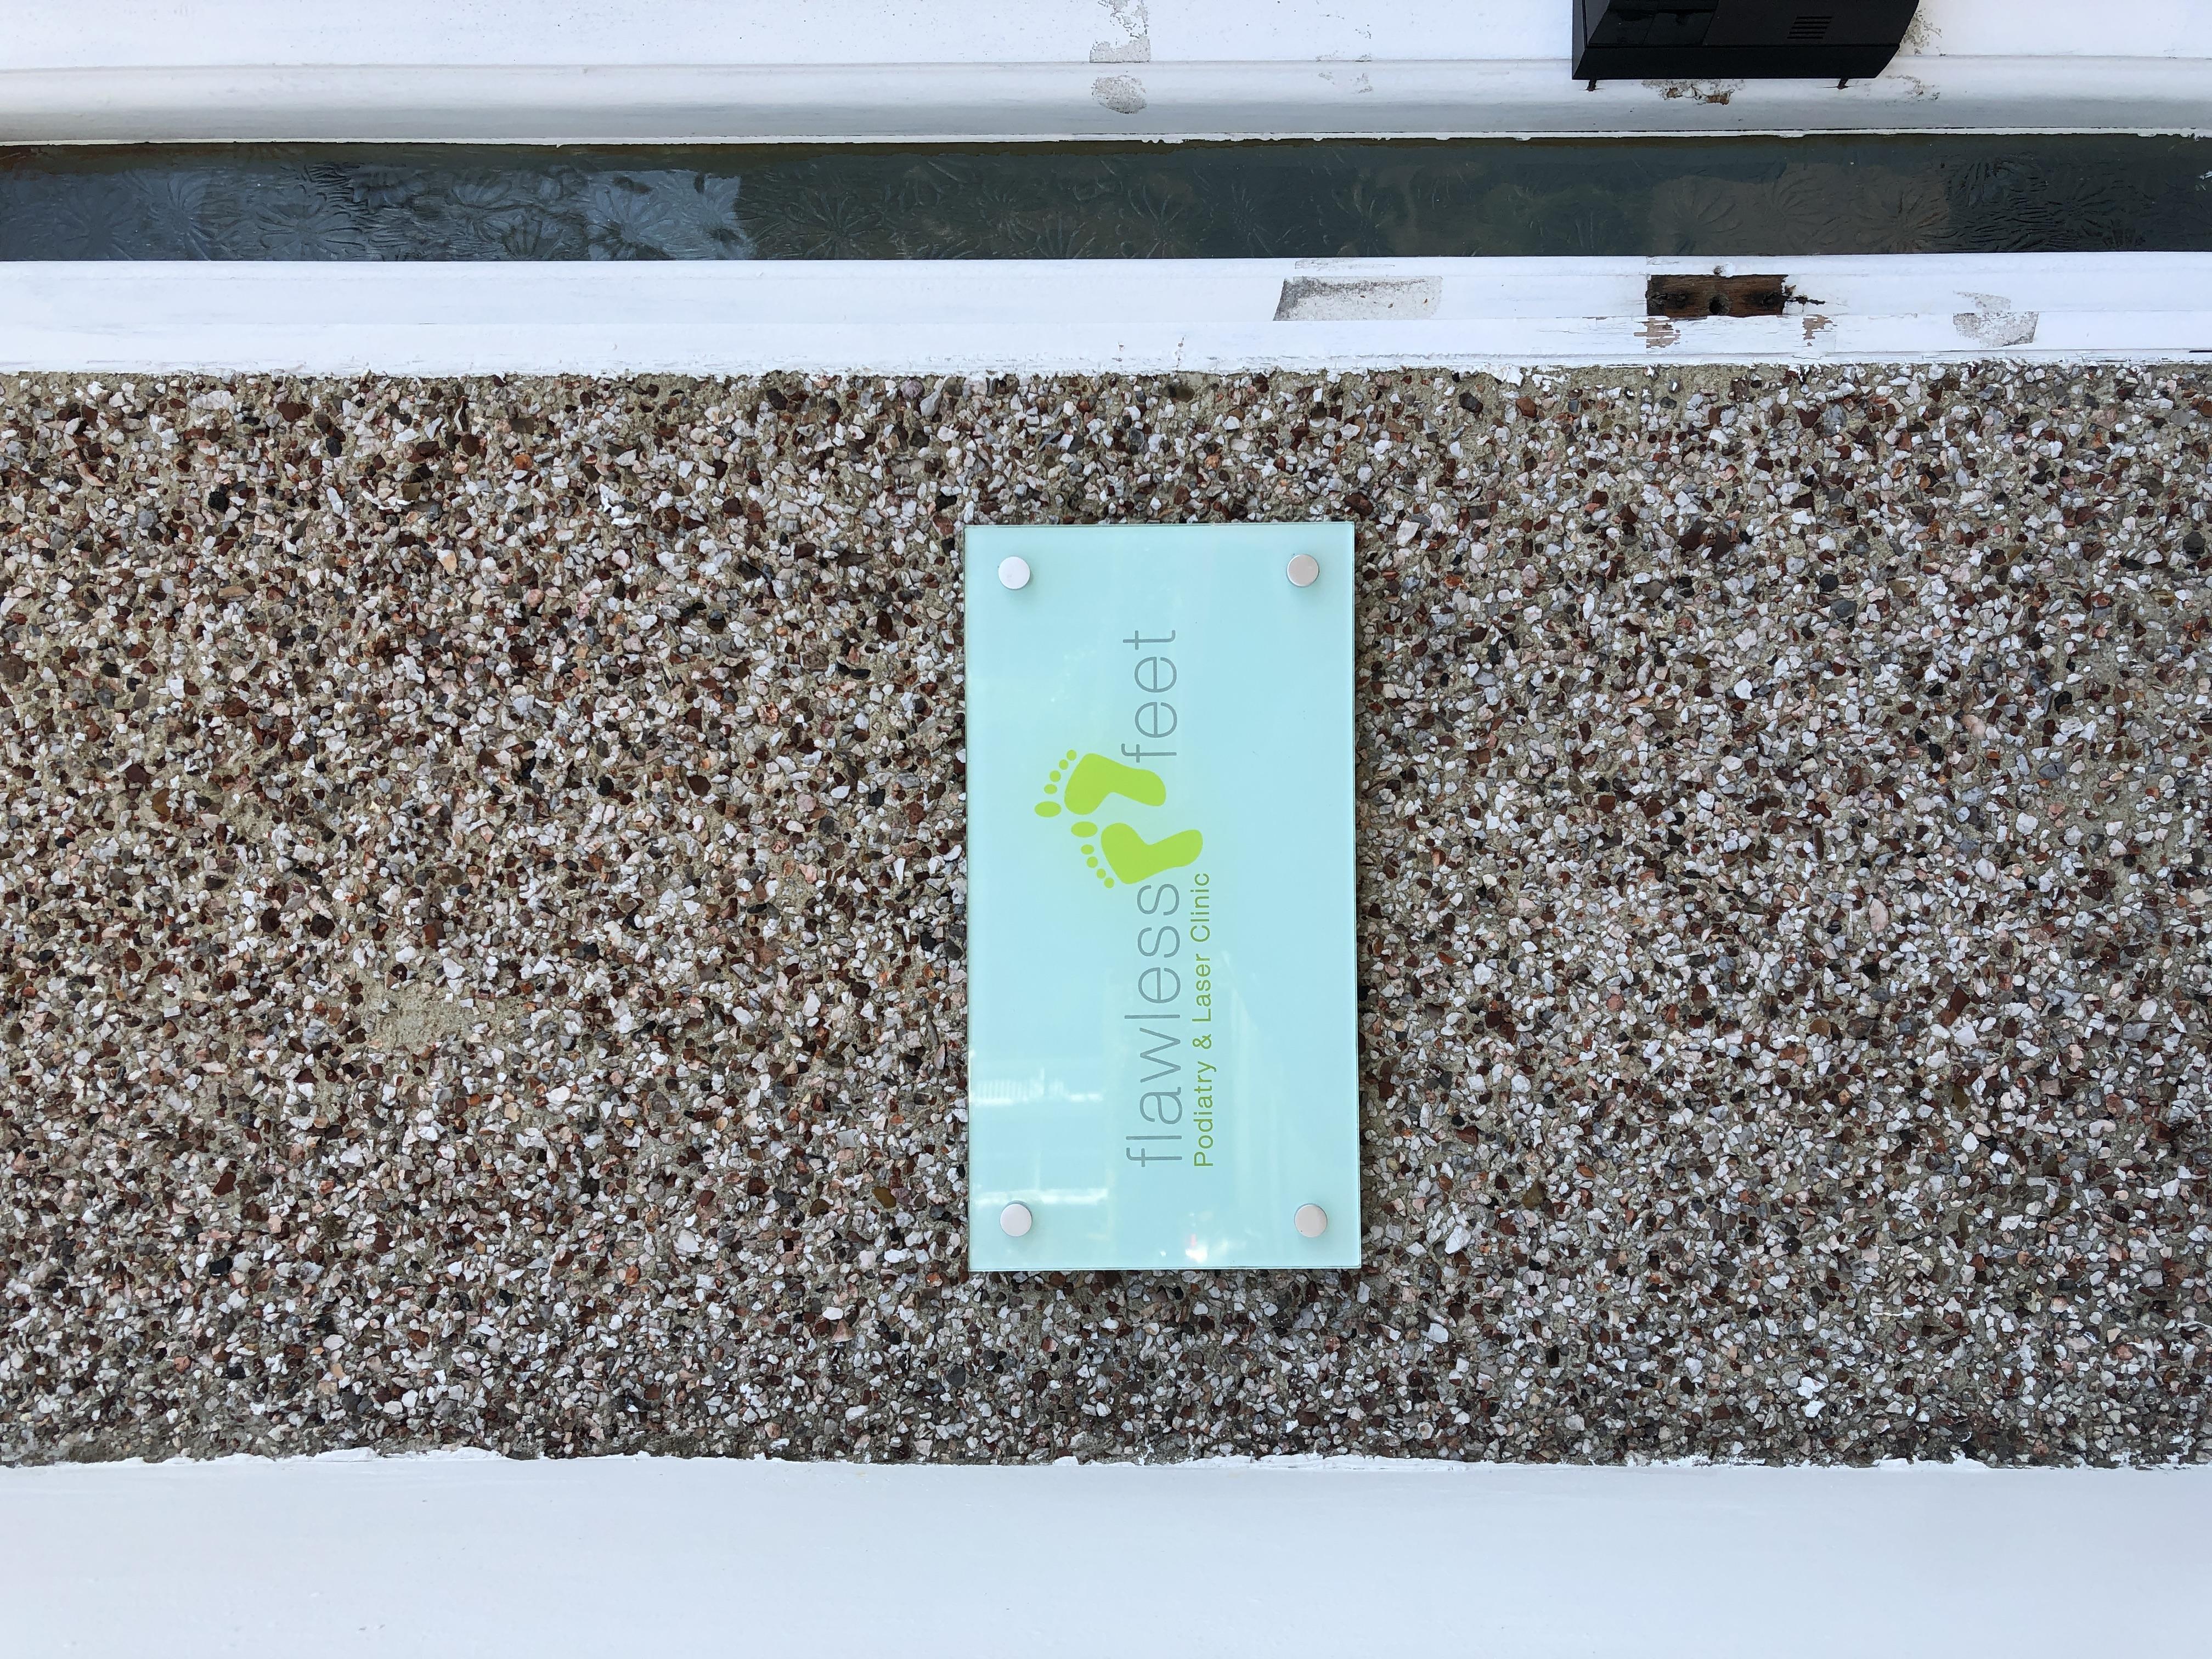 Flawless Feet Podiatry & Laser Clinic | 16 Garlies Road, Forest Hill, London SE23 2RT | +44 20 3713 8361